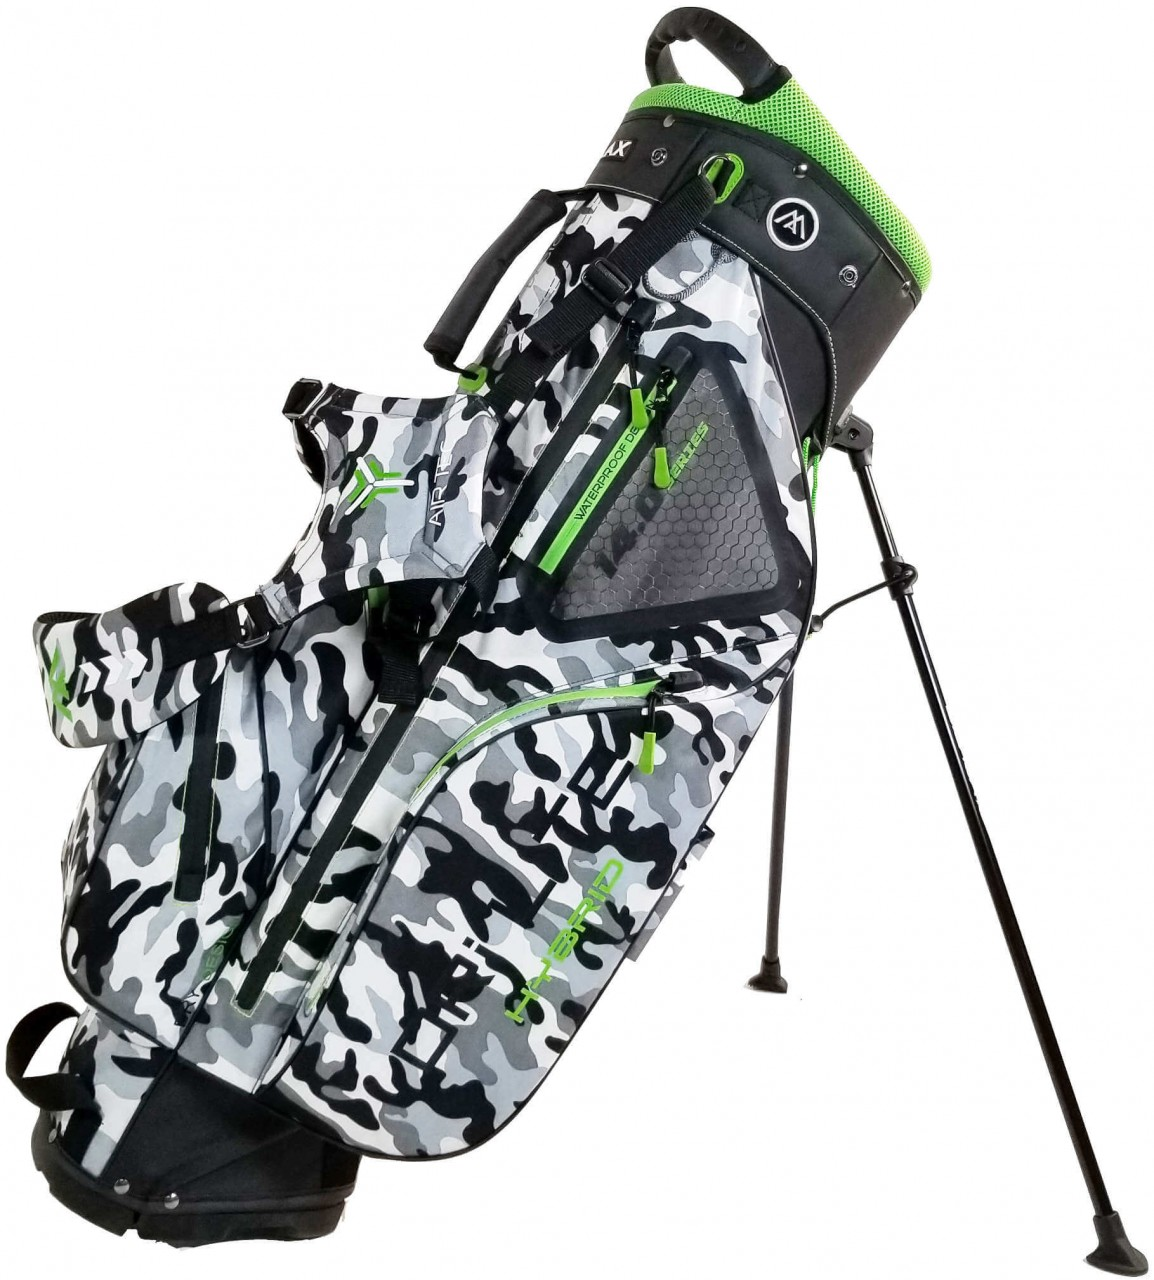 Dri Lite Hybrid 14 Standbag, camouflage